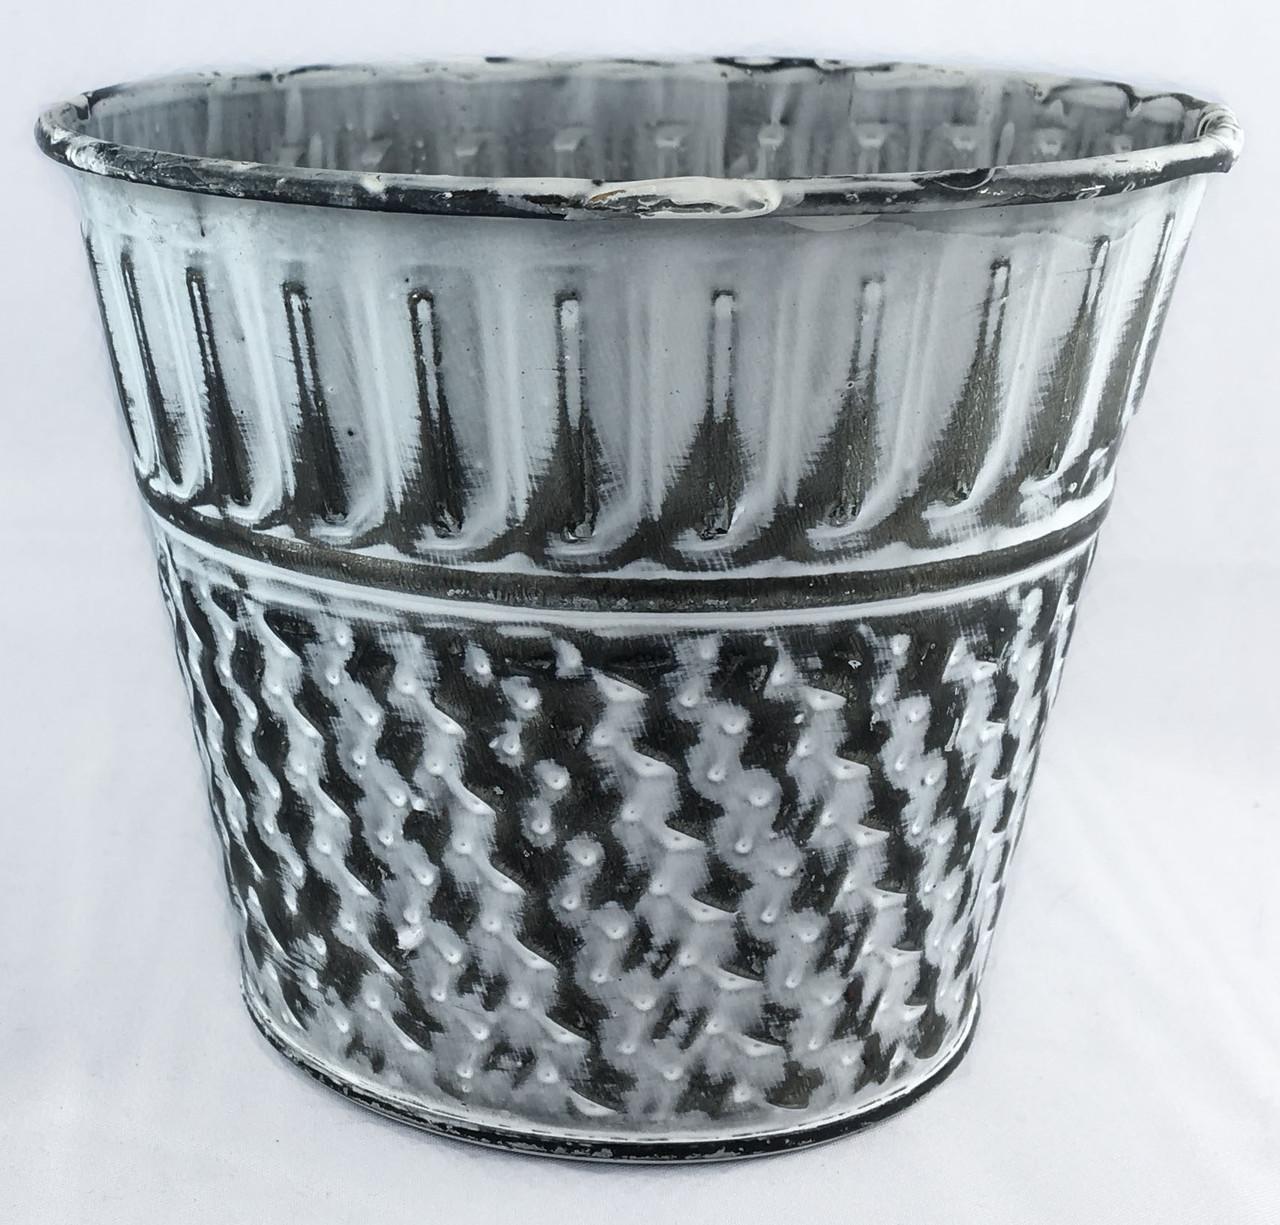 Декоративное кашпо из метала 9,5 х 12 см